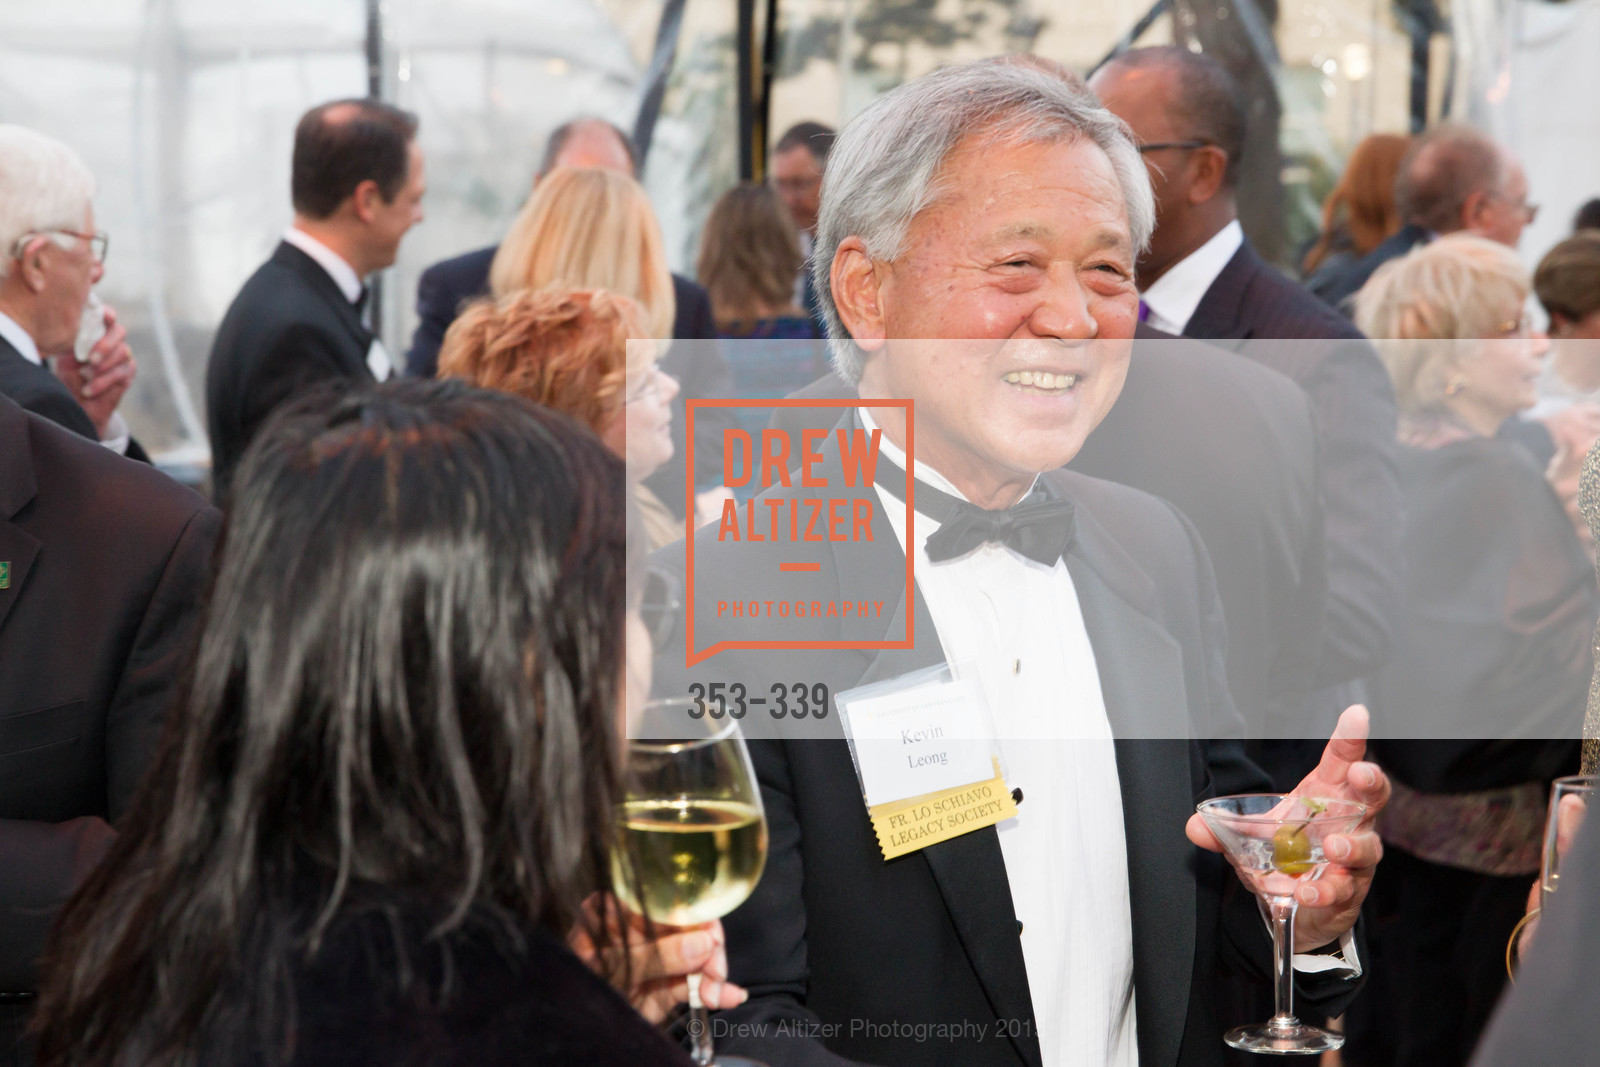 Kevin Leong, University of San Francisco Alumni Awards Gala 2015, University of San Francisco, October 2nd, 2015,Drew Altizer, Drew Altizer Photography, full-service agency, private events, San Francisco photographer, photographer california